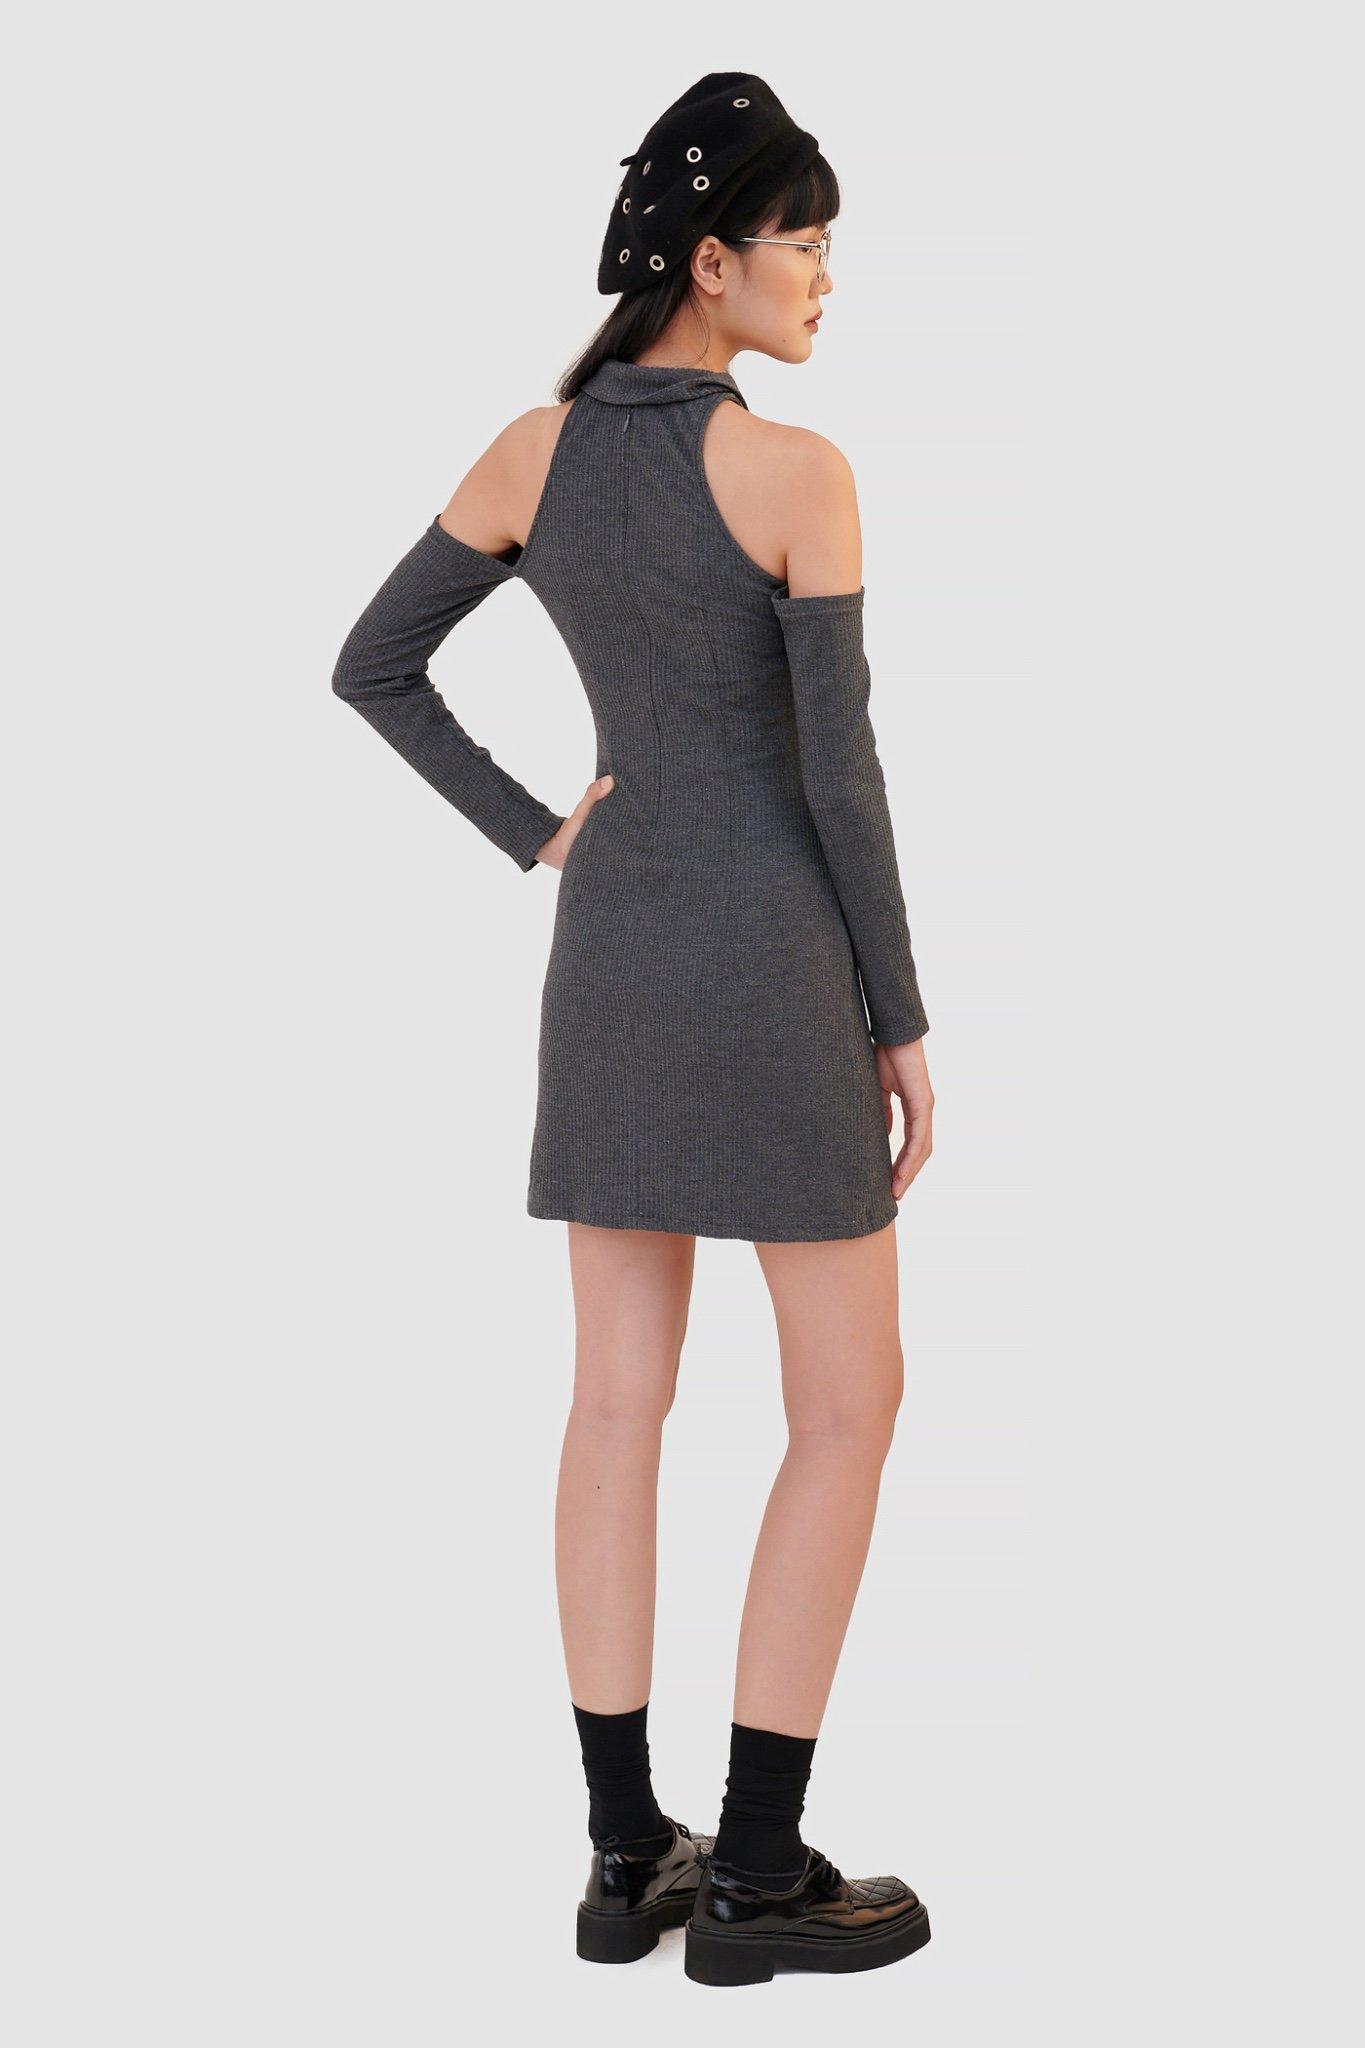 Đầm knit cutout vai